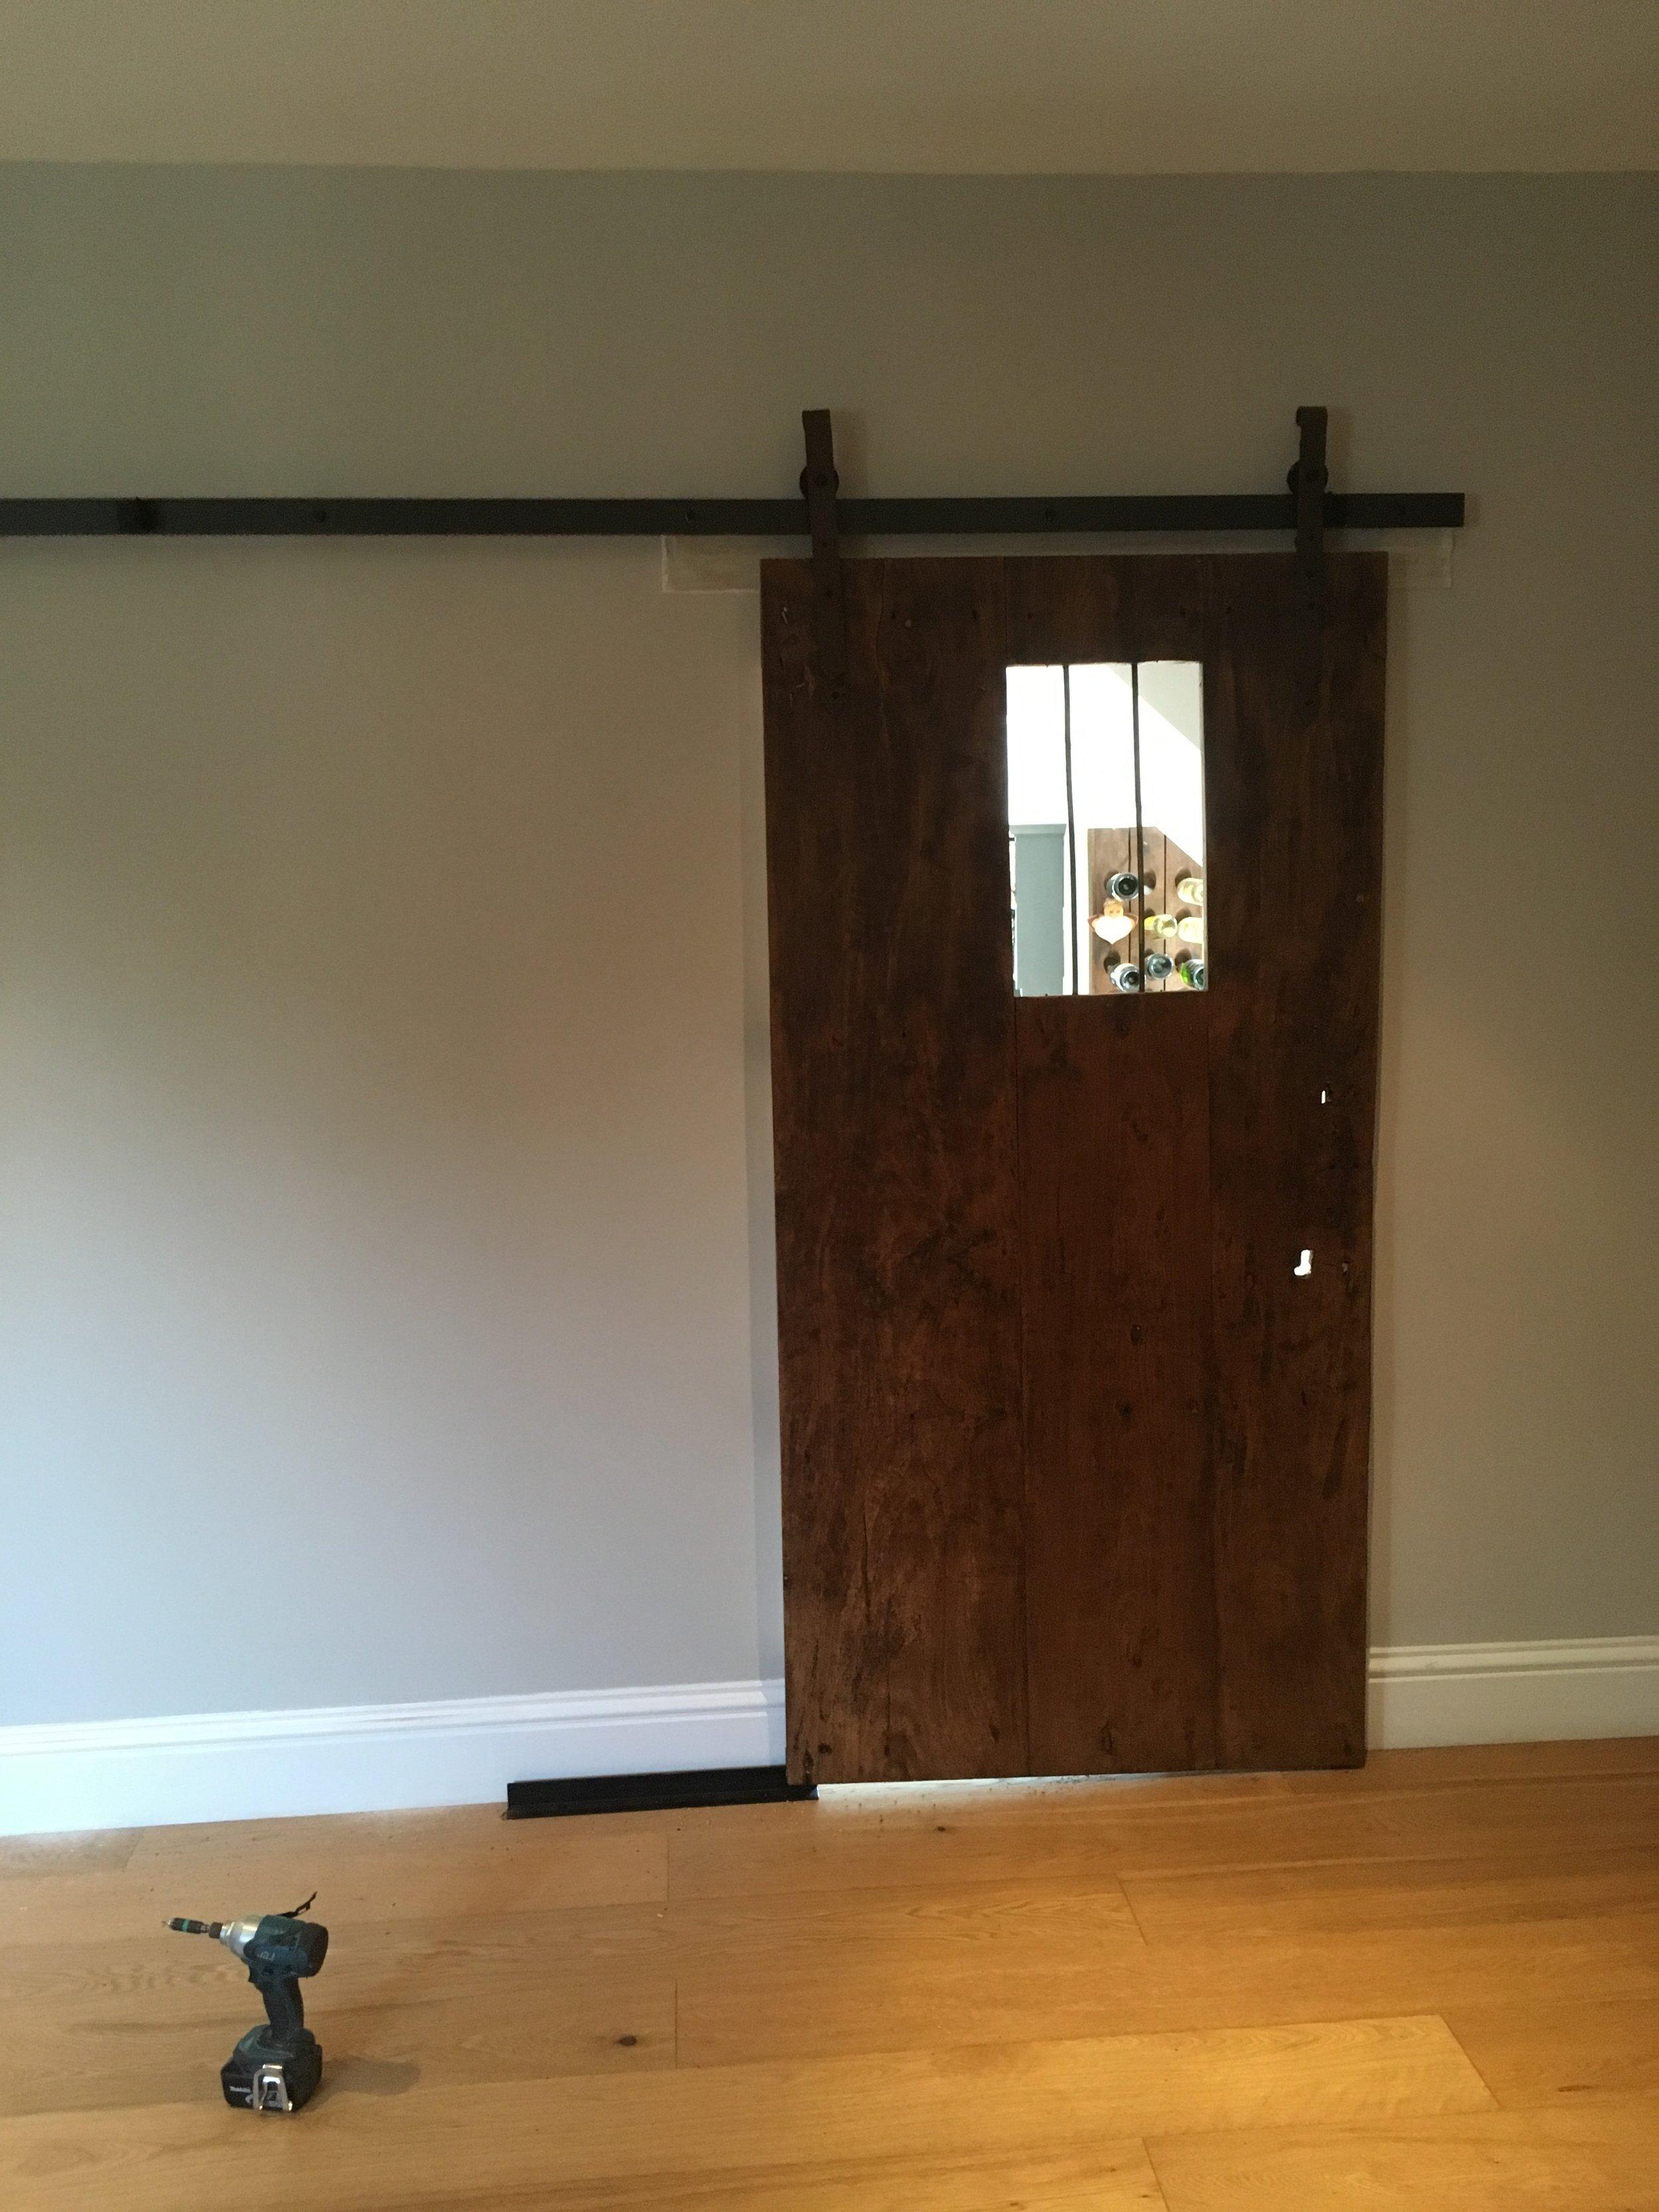 Finished door in situe